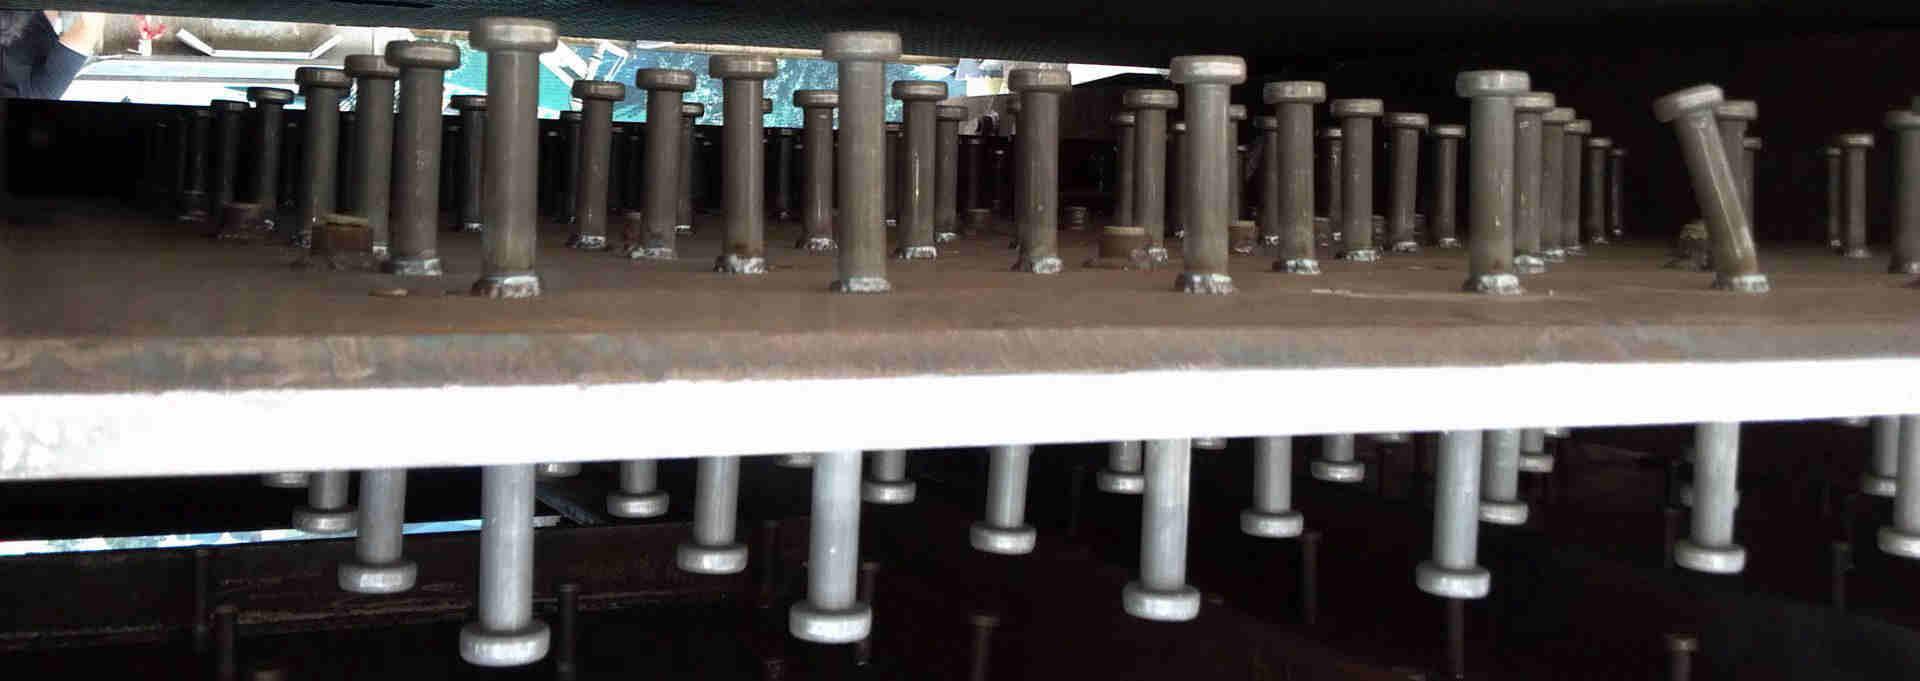 Shear studs on steel beam